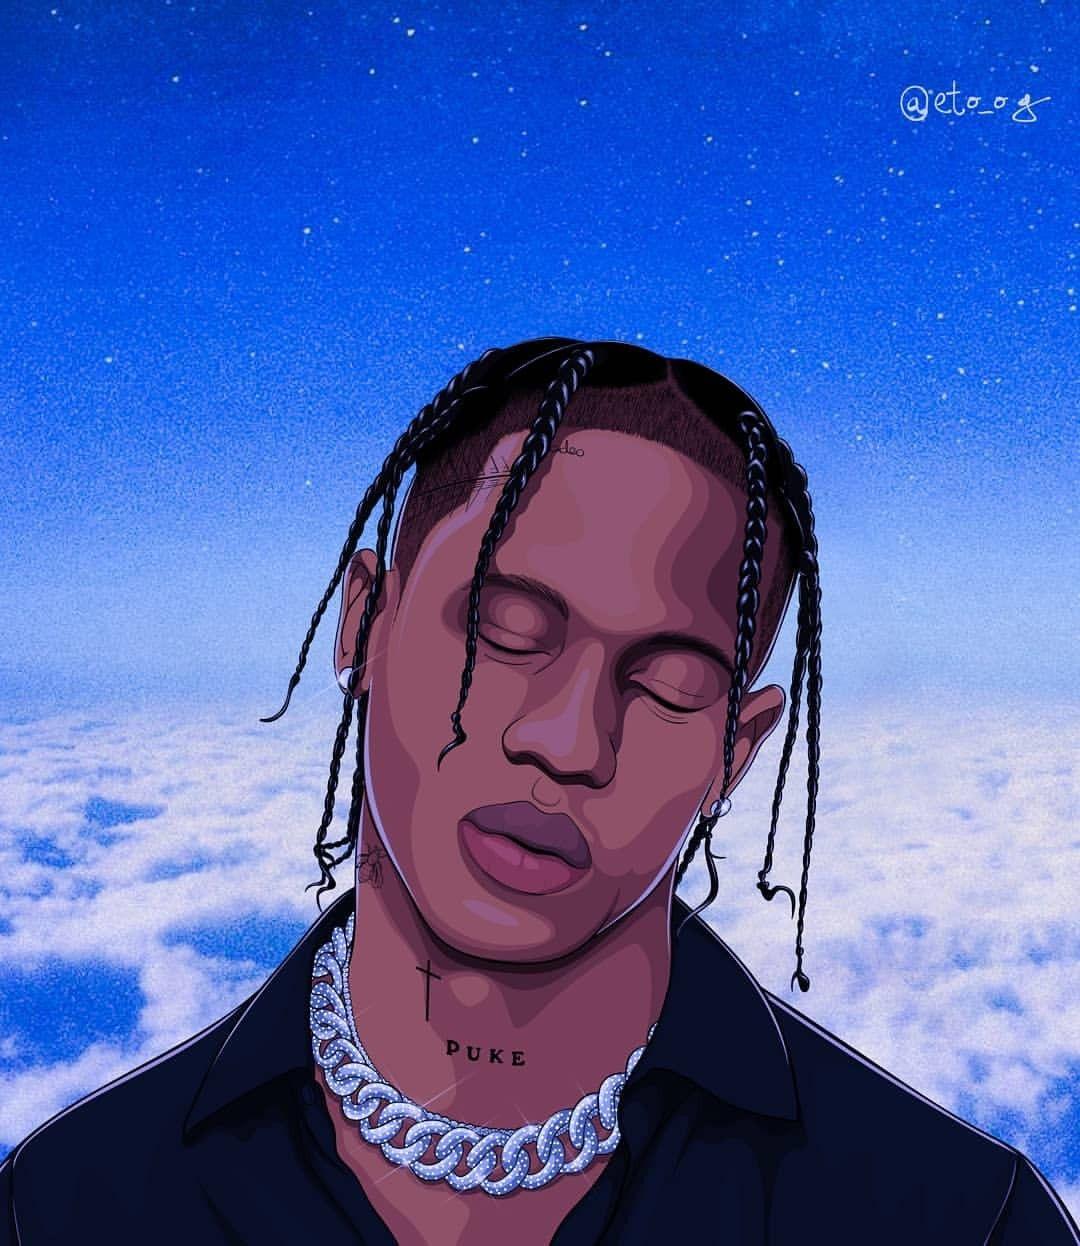 I M Highest In The Room In 2020 Travis Scott Art Hip Hop Art Rapper Art